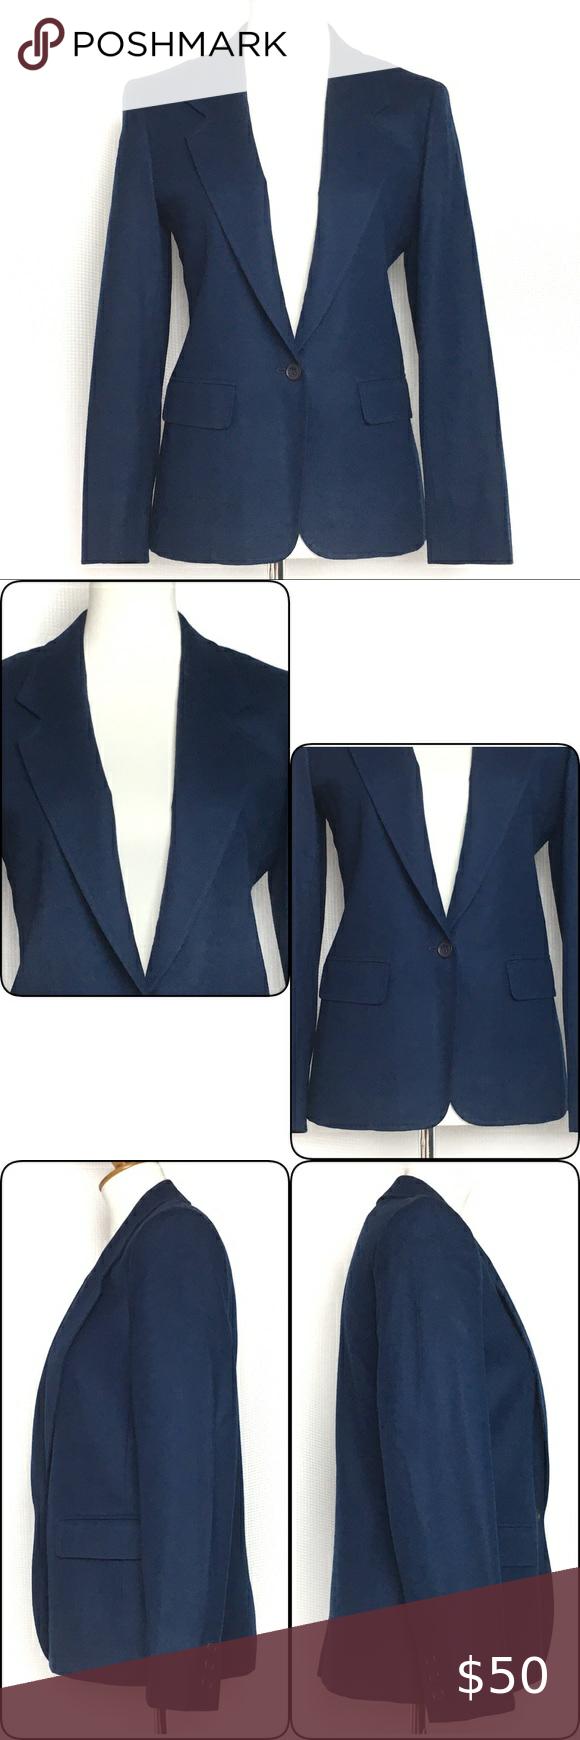 Side Pockets Single Button Closure. No Collar Style 1980/'s Blazer Pendleton WOOL Petite Size 8